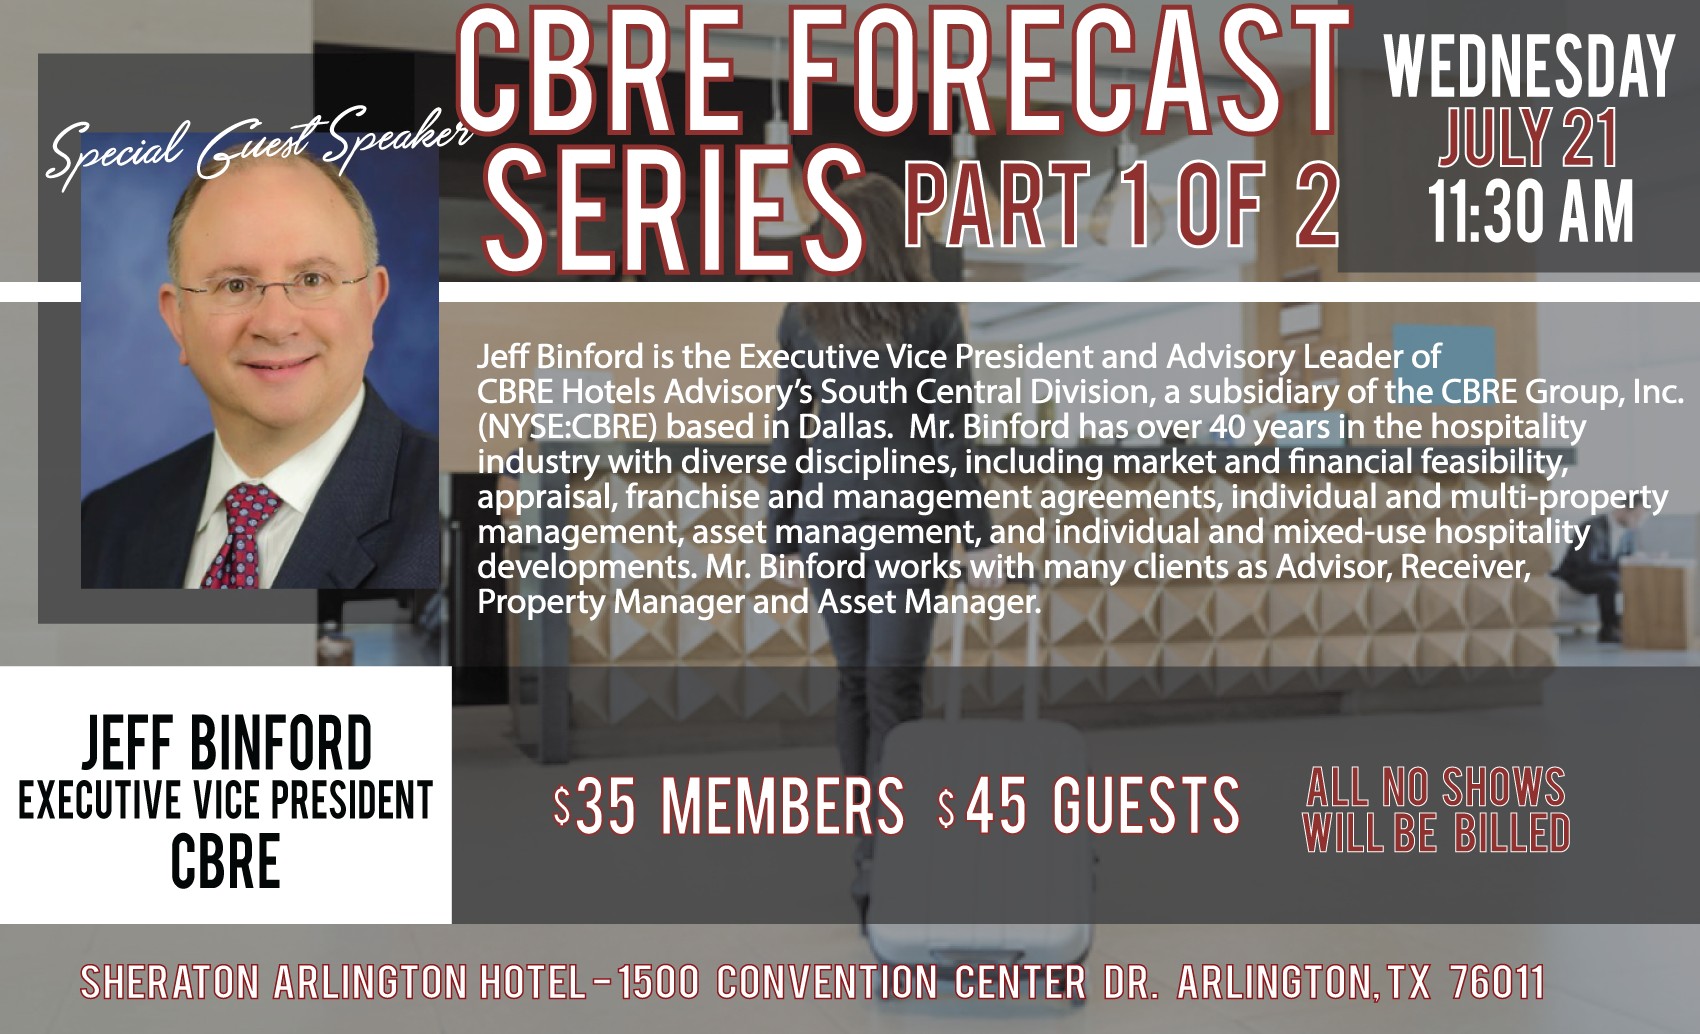 July CBRE Forecast Series Part 1